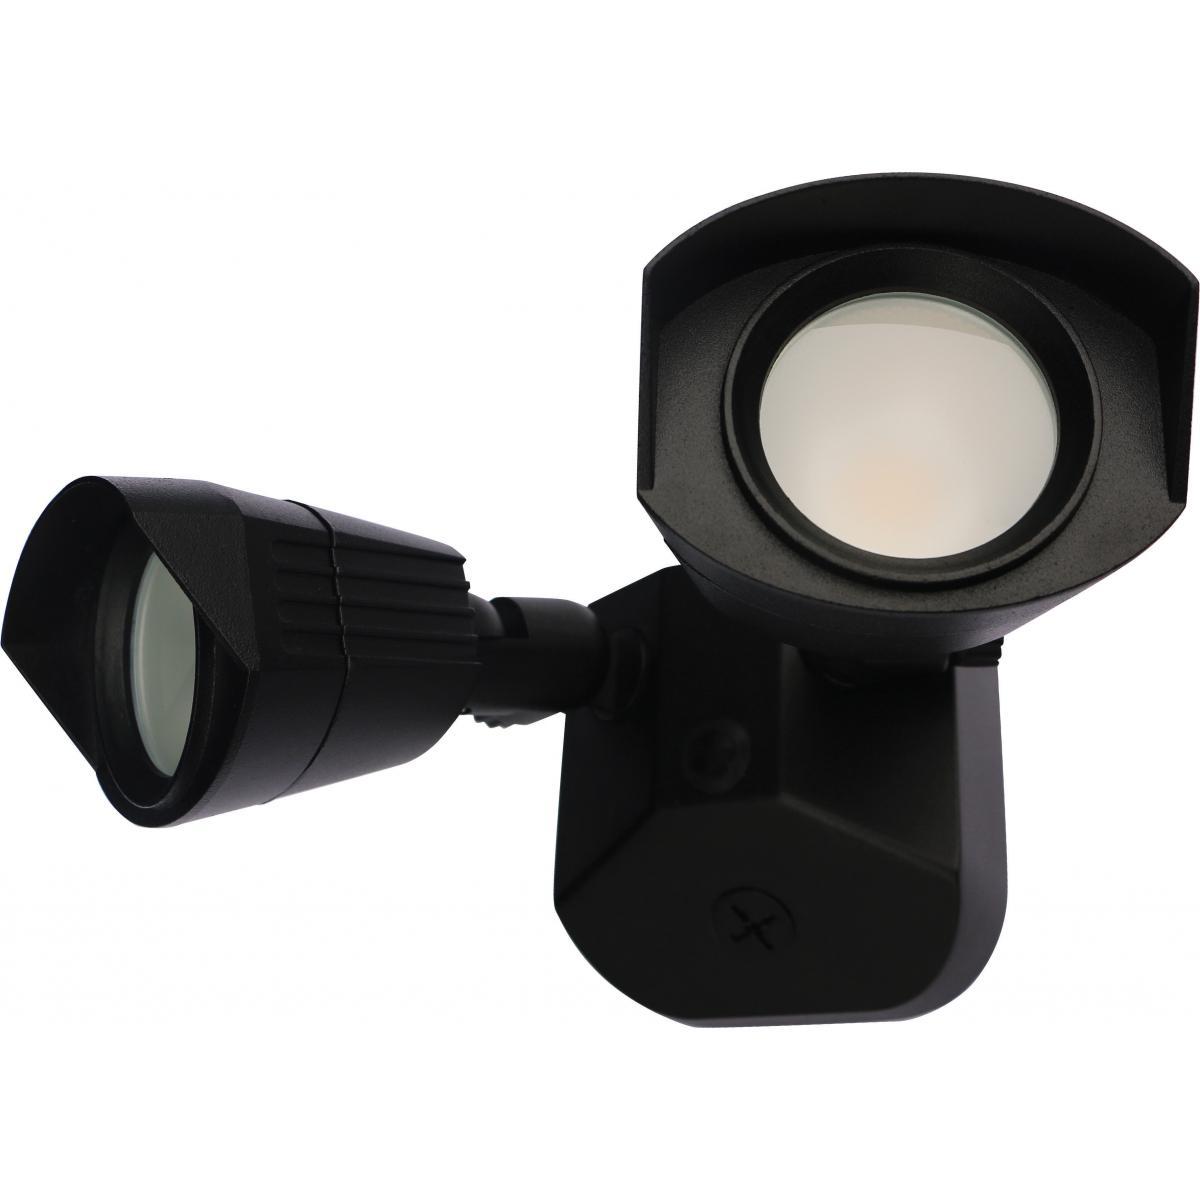 65-214 LED DUAL HEAD SECURITY LIGHT